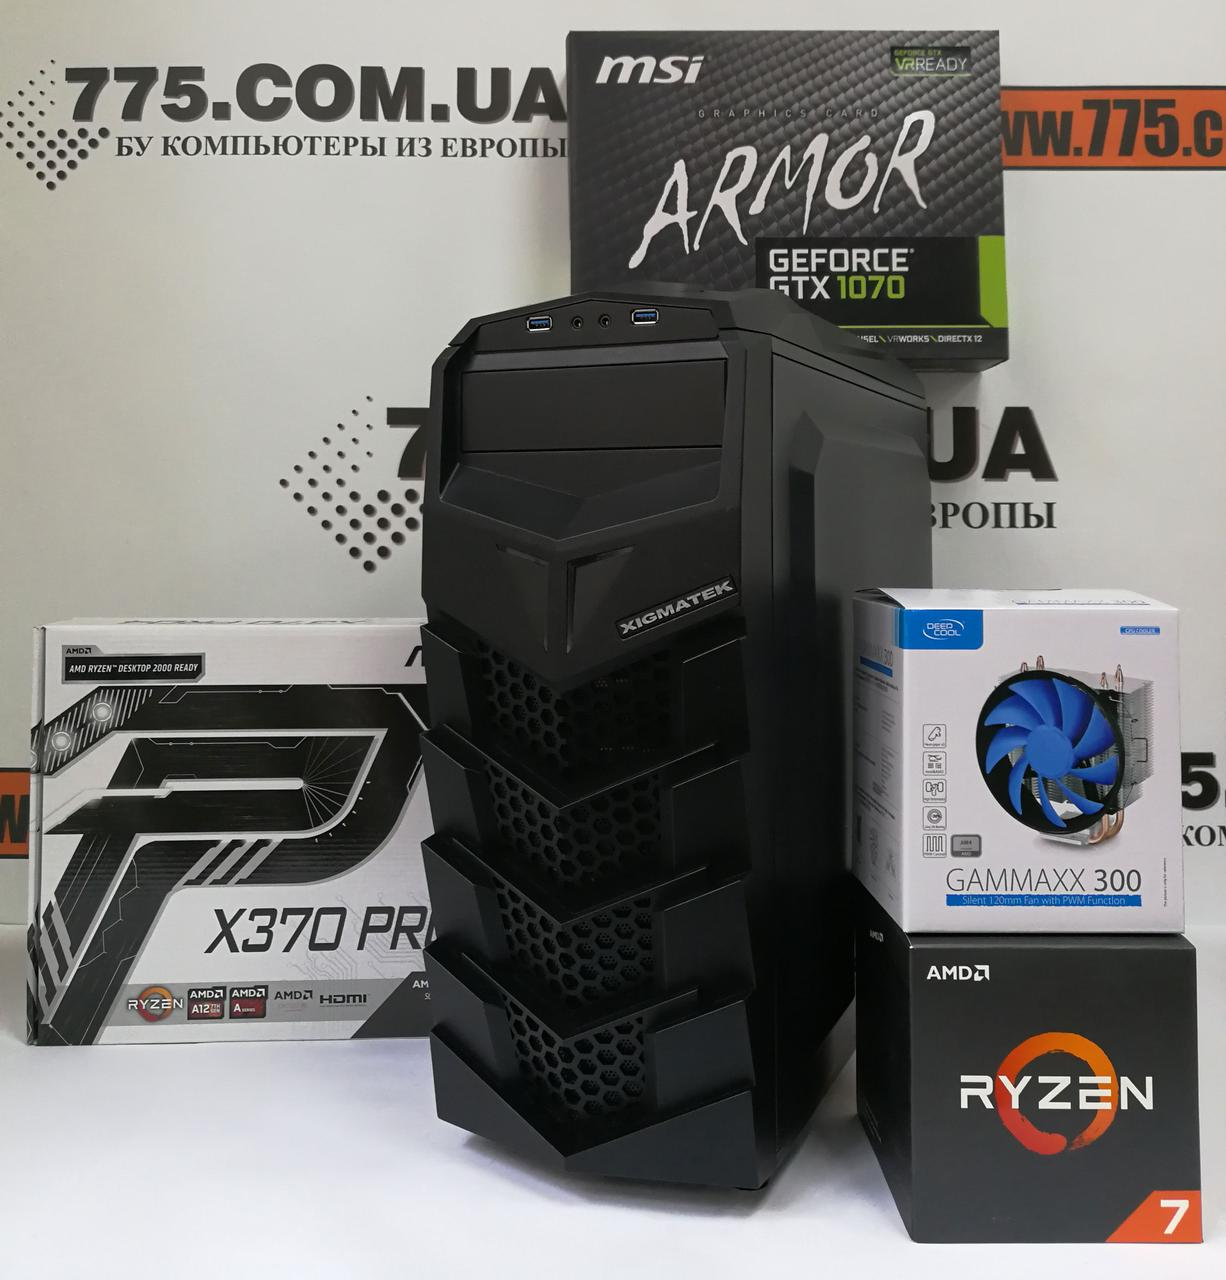 Игровой компьютер, AMD Ryzen 7 1700 3.7GHz (16 потоков), 16ГБ DDR4, SSD 240ГБ, HDD 1ТБ, GTX 1070 8ГБ